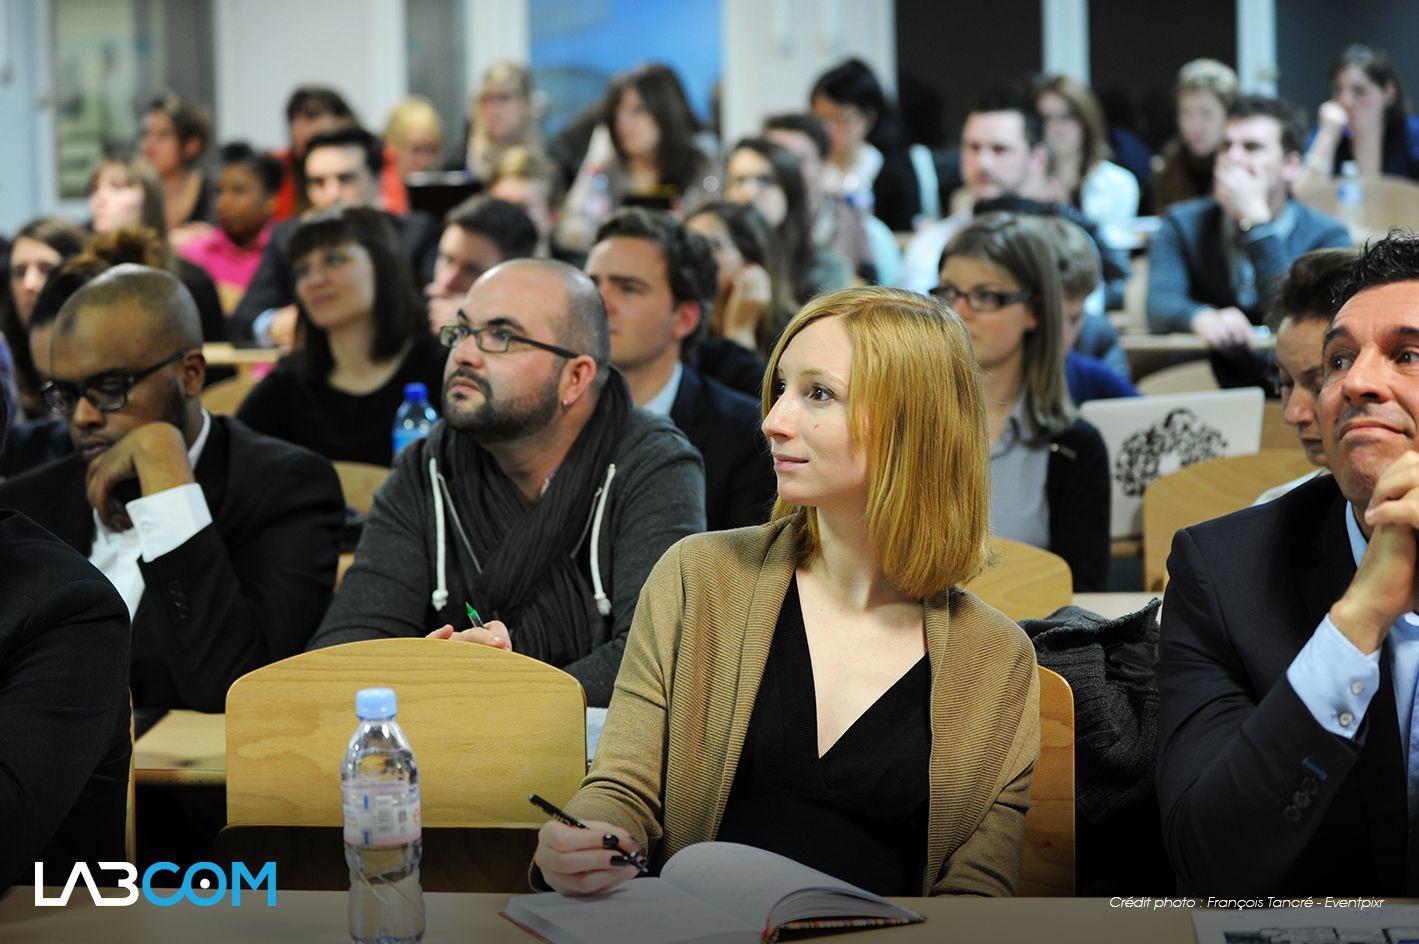 @Naguib Toihiri & @Christian Peters  Membres du public - Amphi MBA ESG Conférence #Labcom